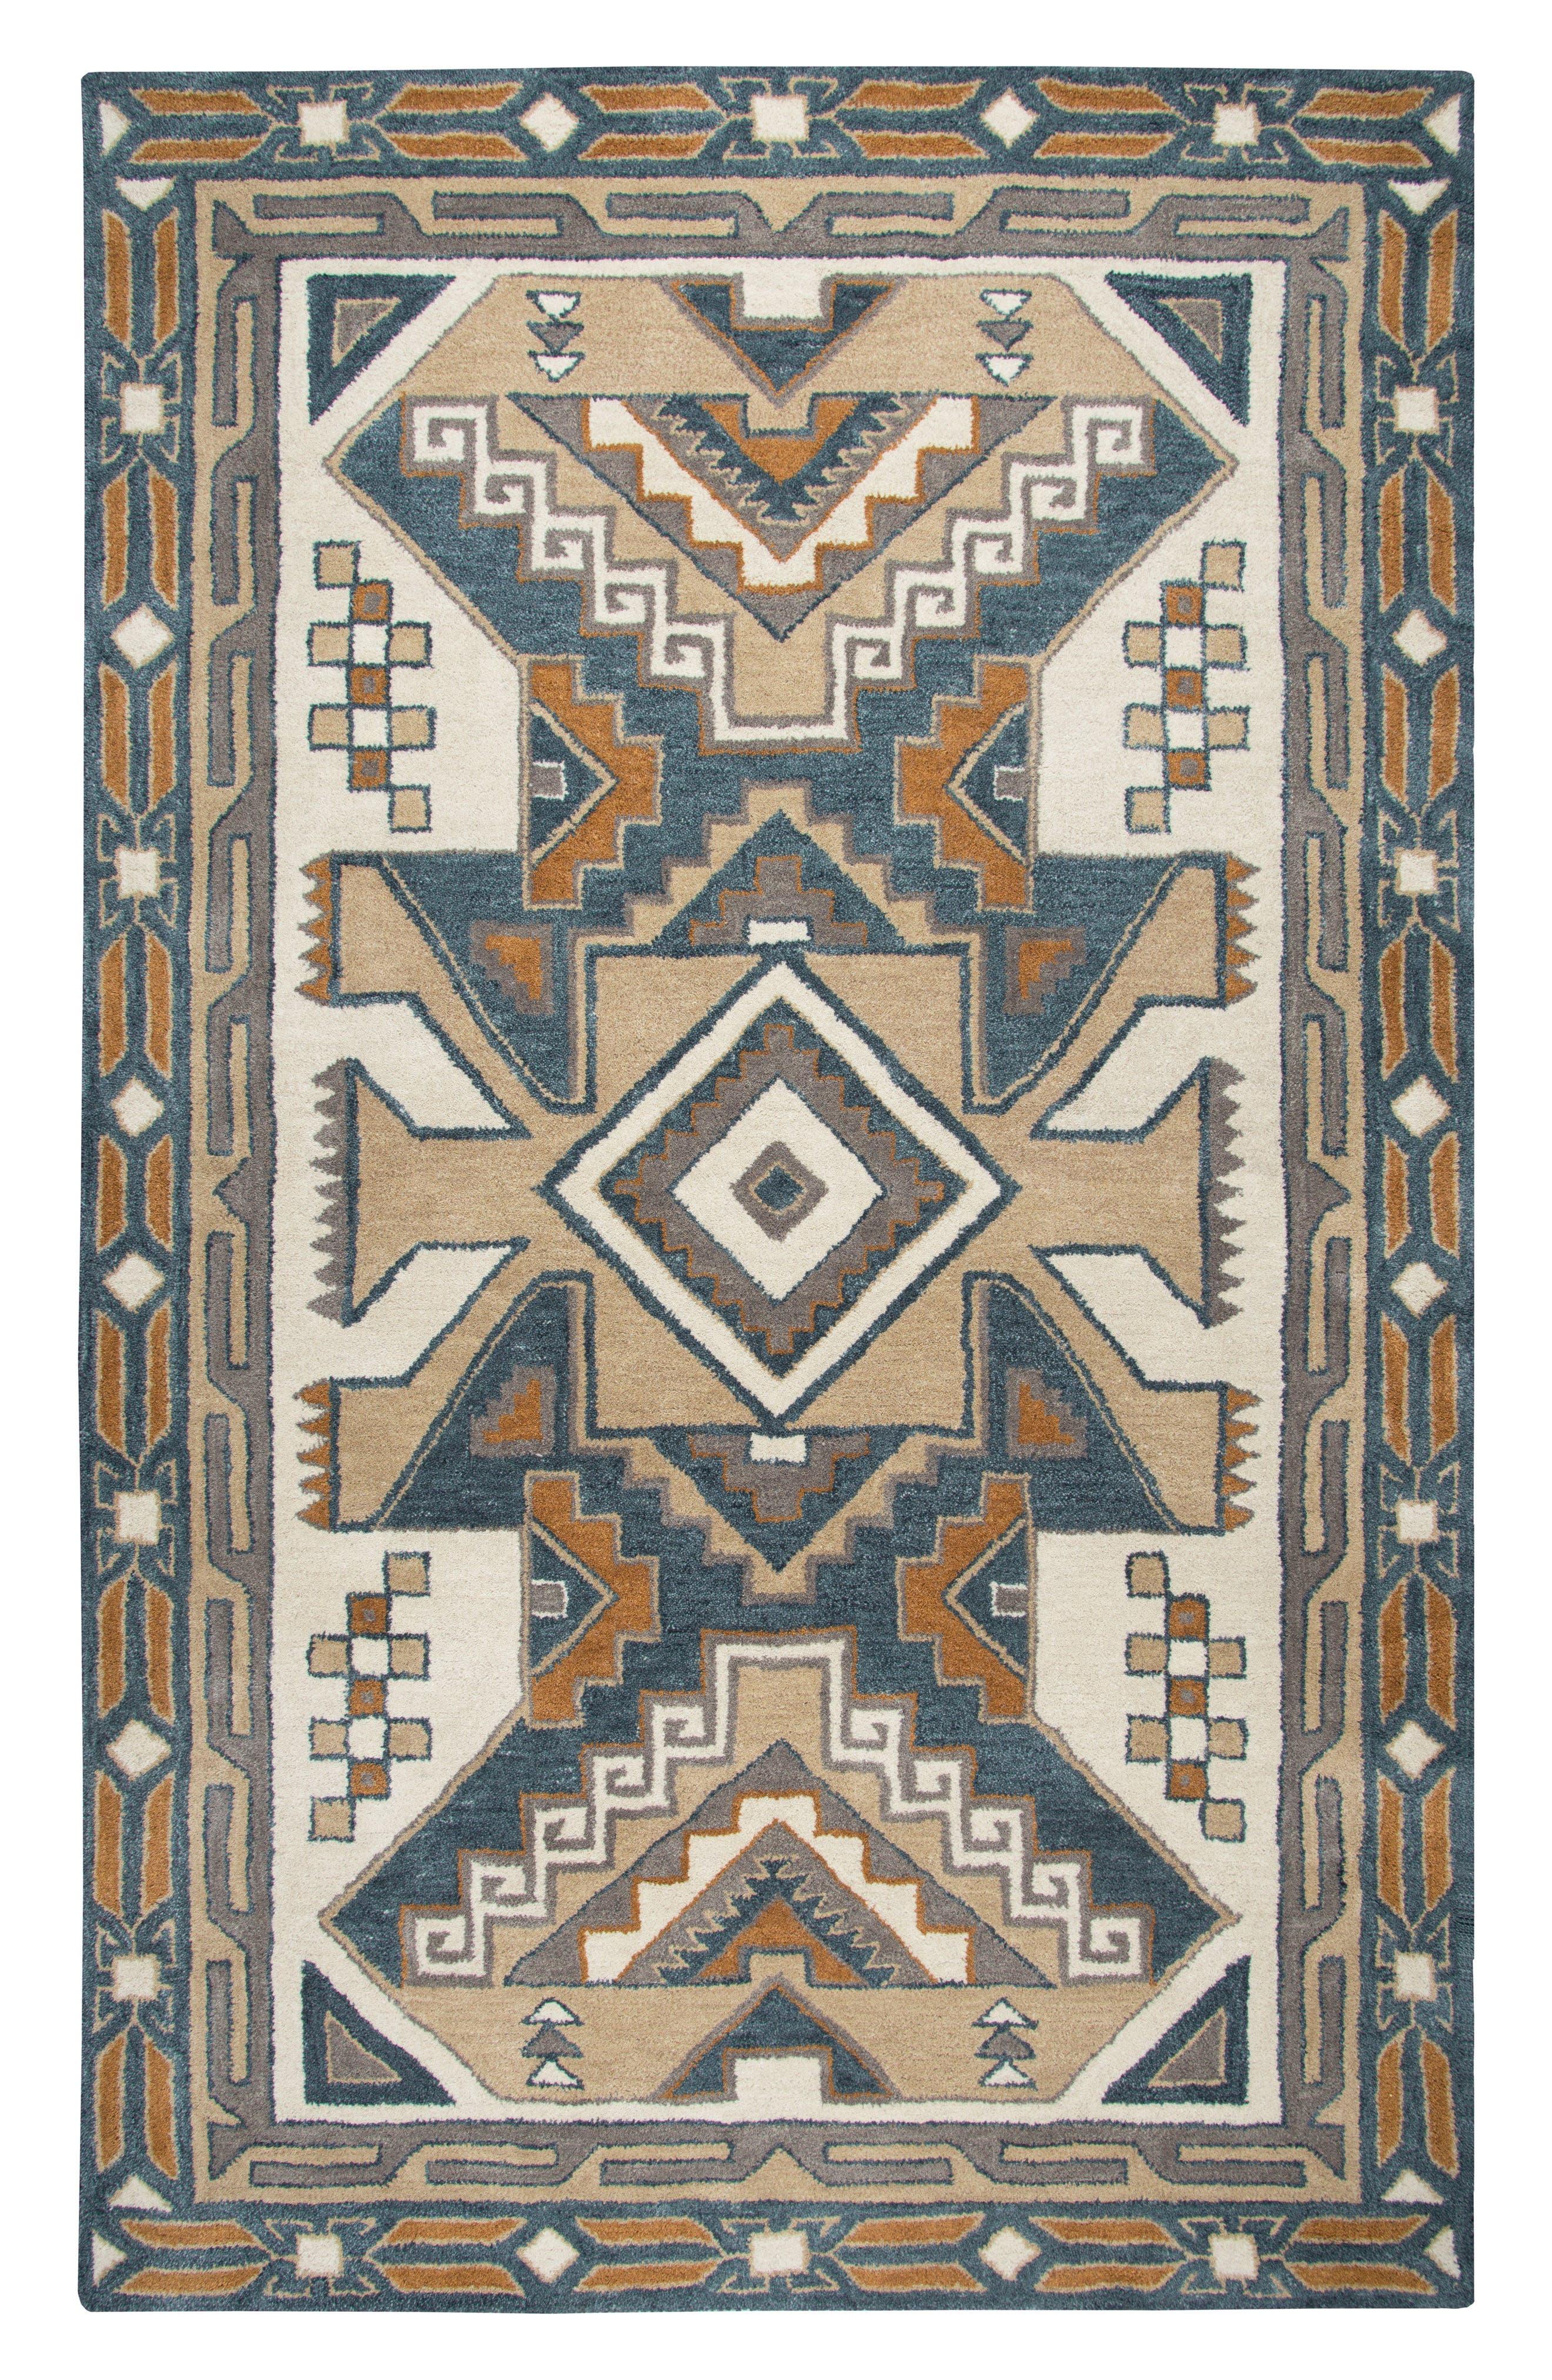 Urban Tiles Hand Tufted Wool Rug,                         Main,                         color, 220